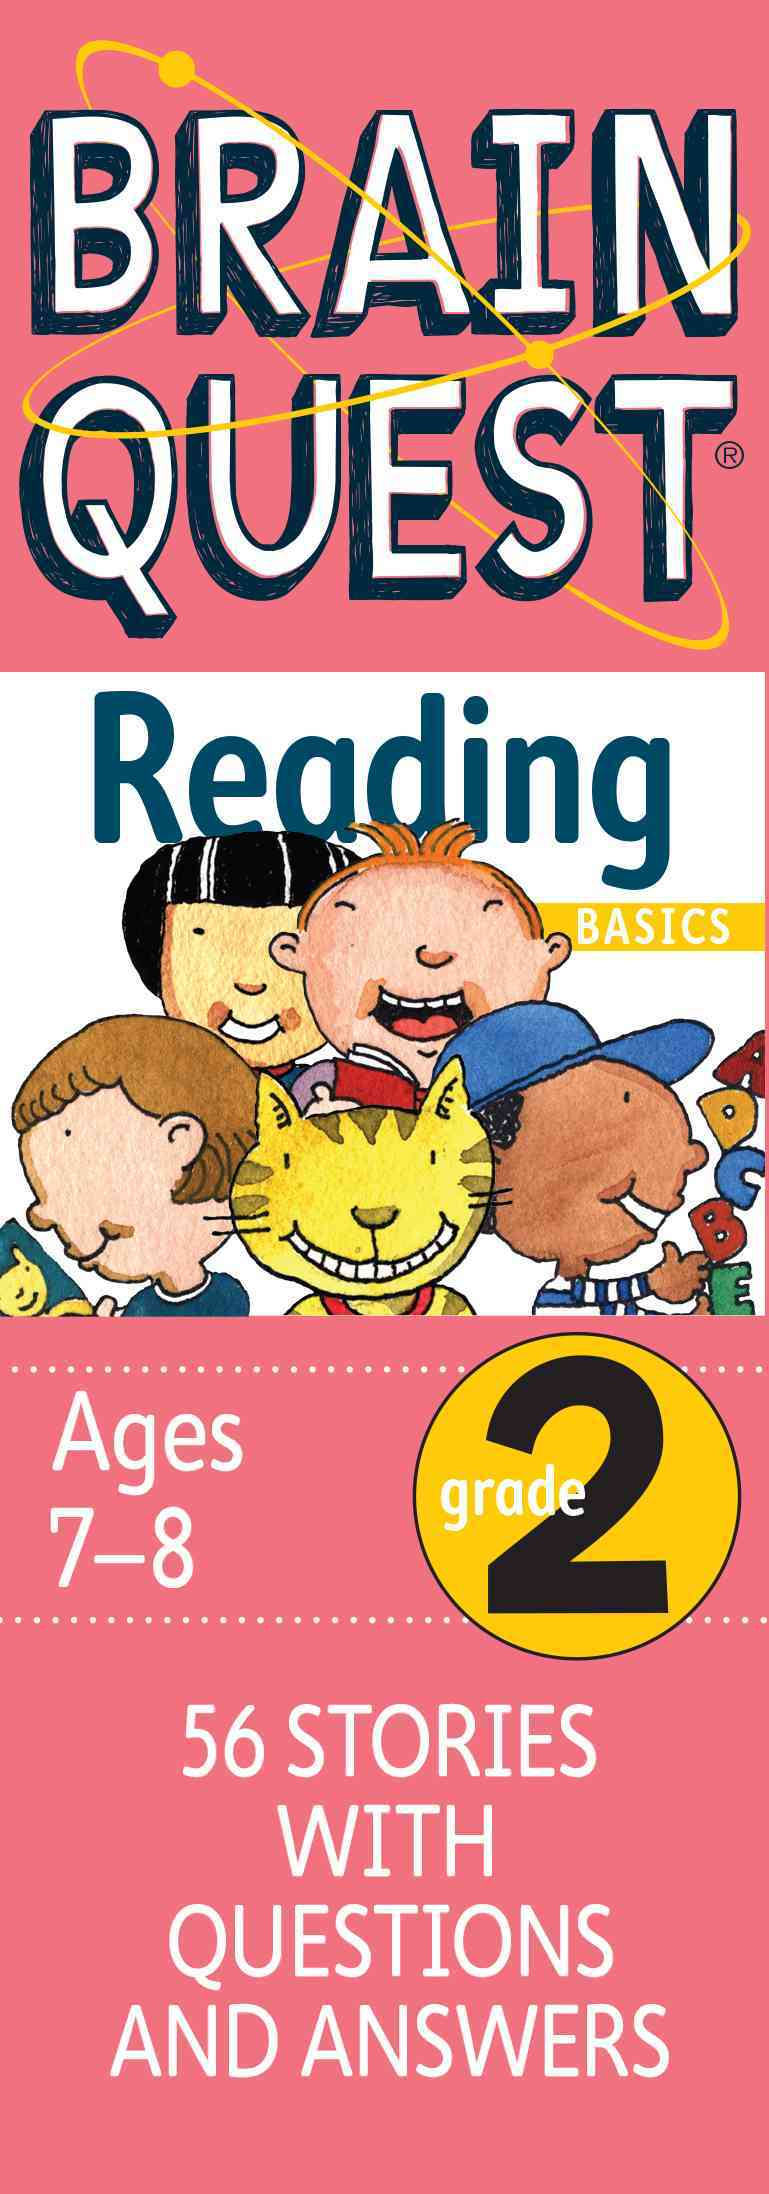 Brain Quest Grade 2 Reading Basics By Workman Publishing (COR)